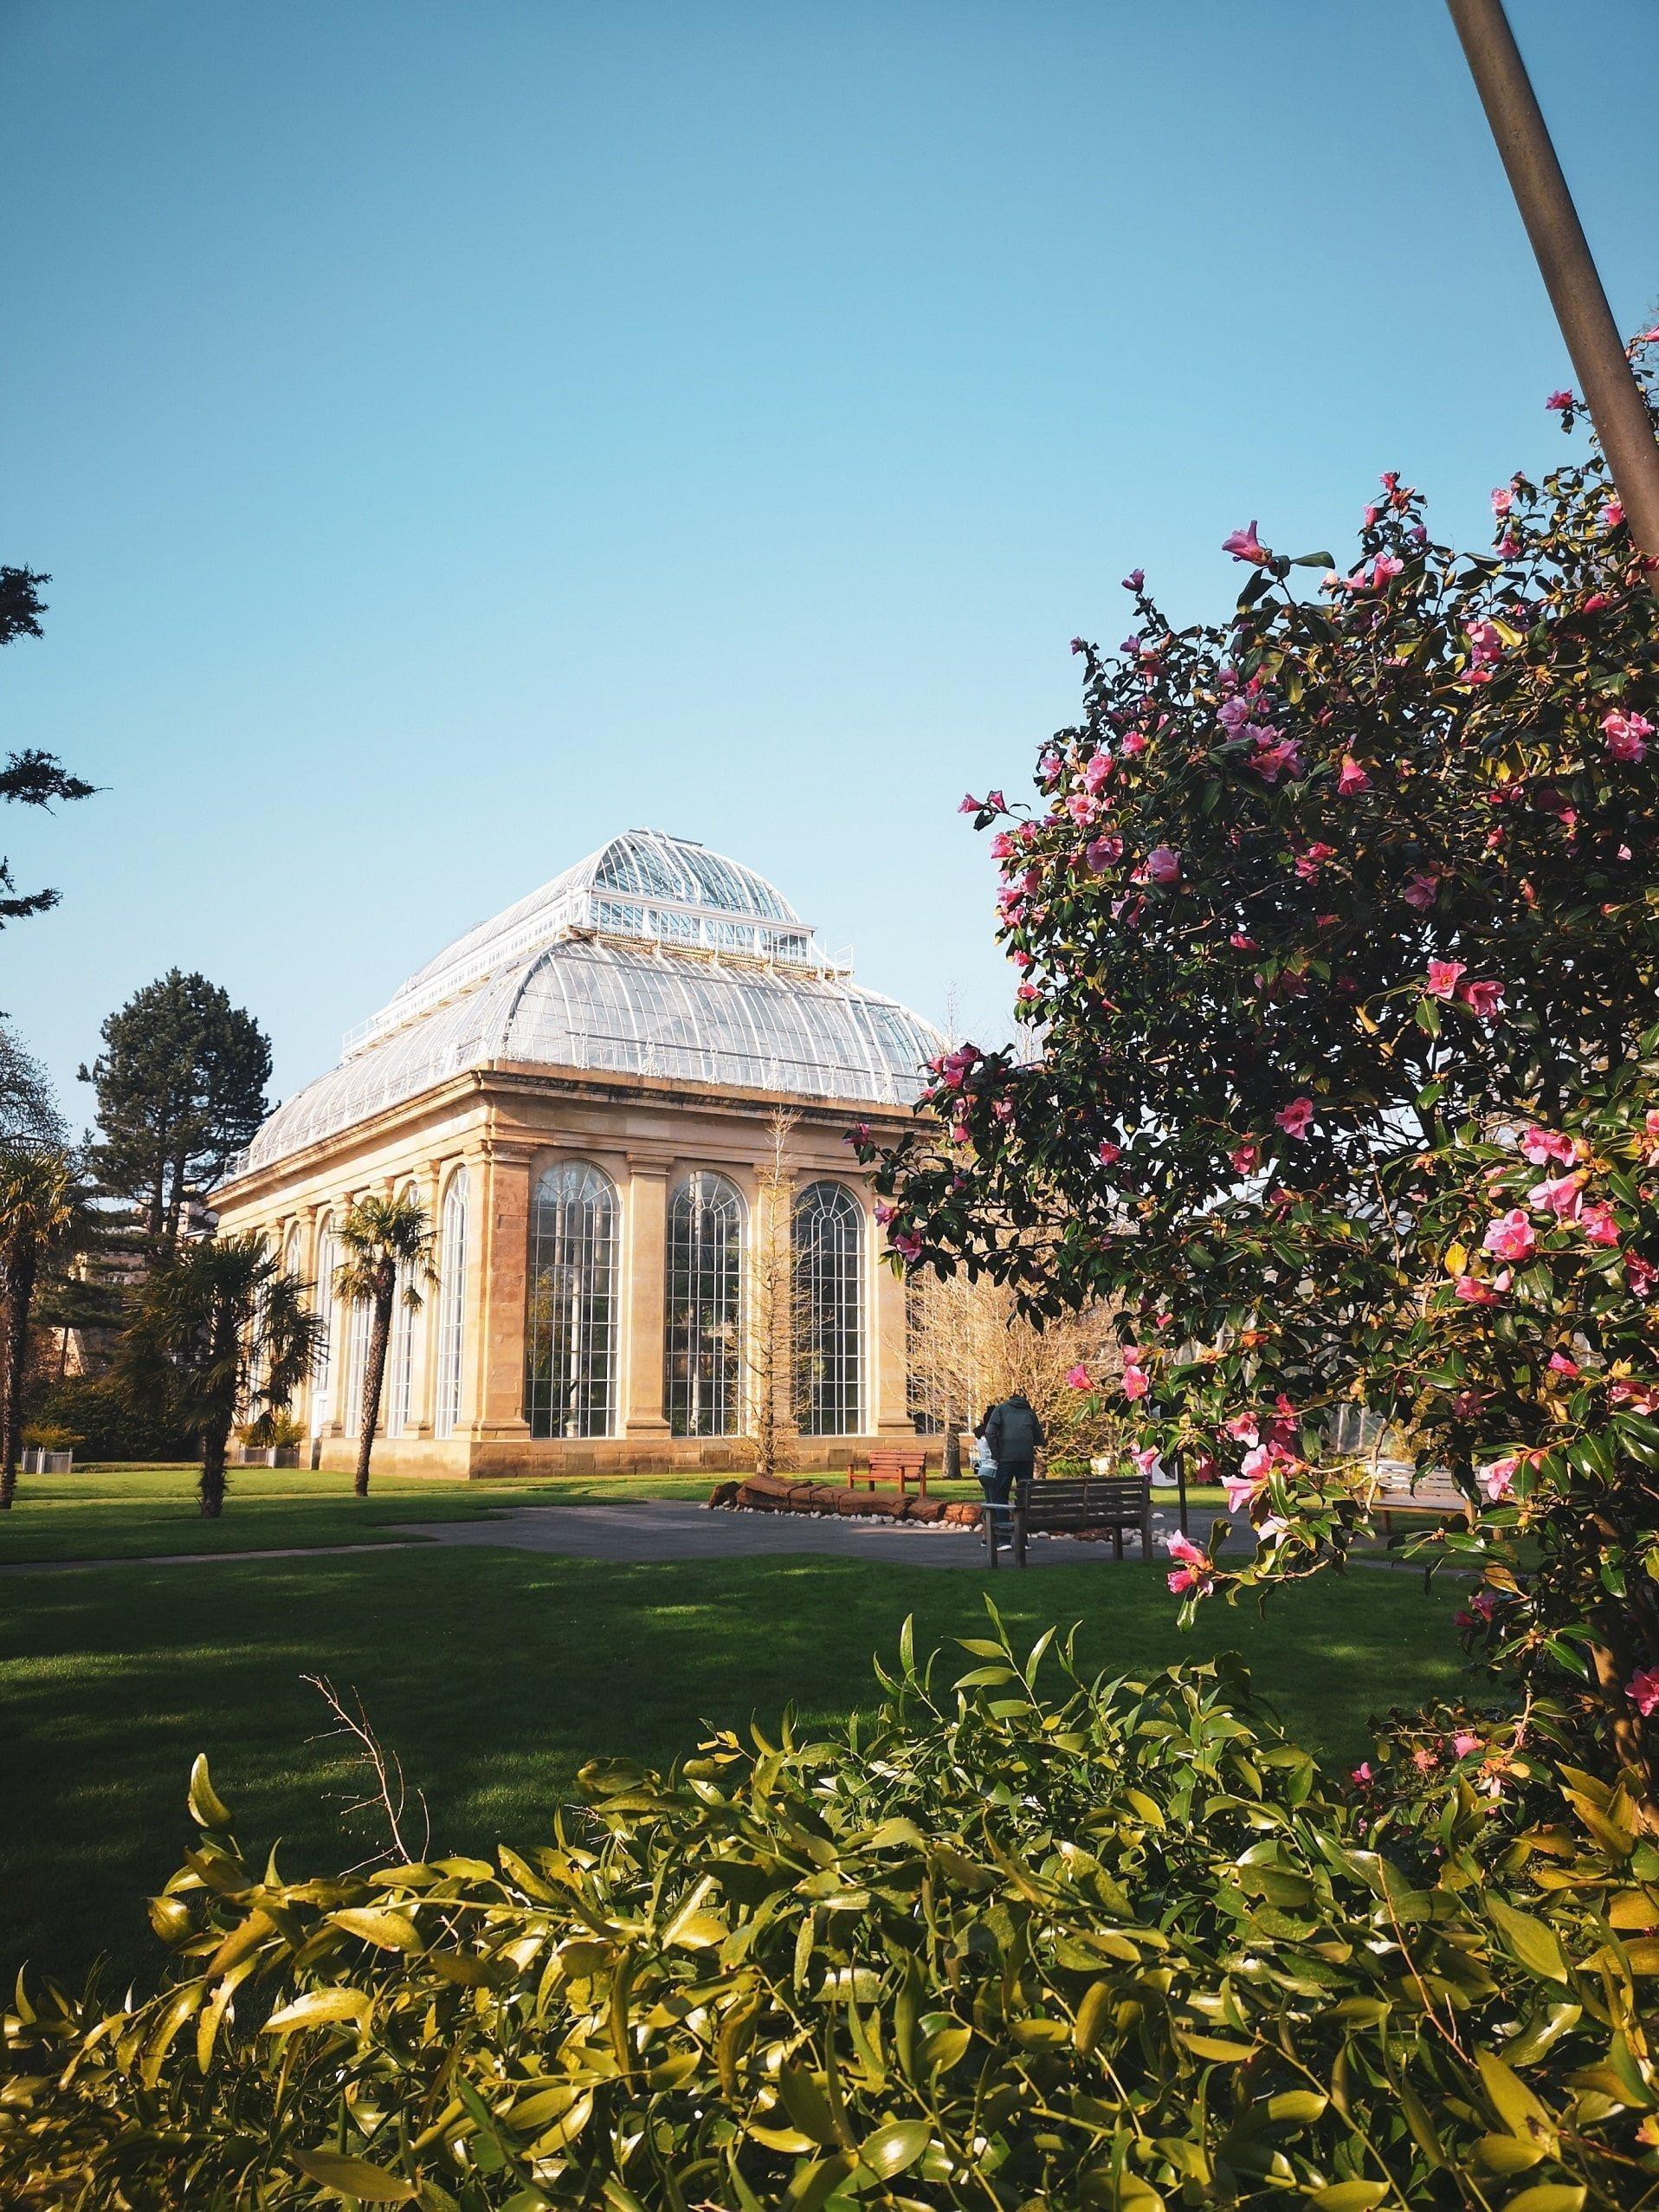 Edinburgh botanic garden and glasshouse, Sustainable Edinburgh Guide